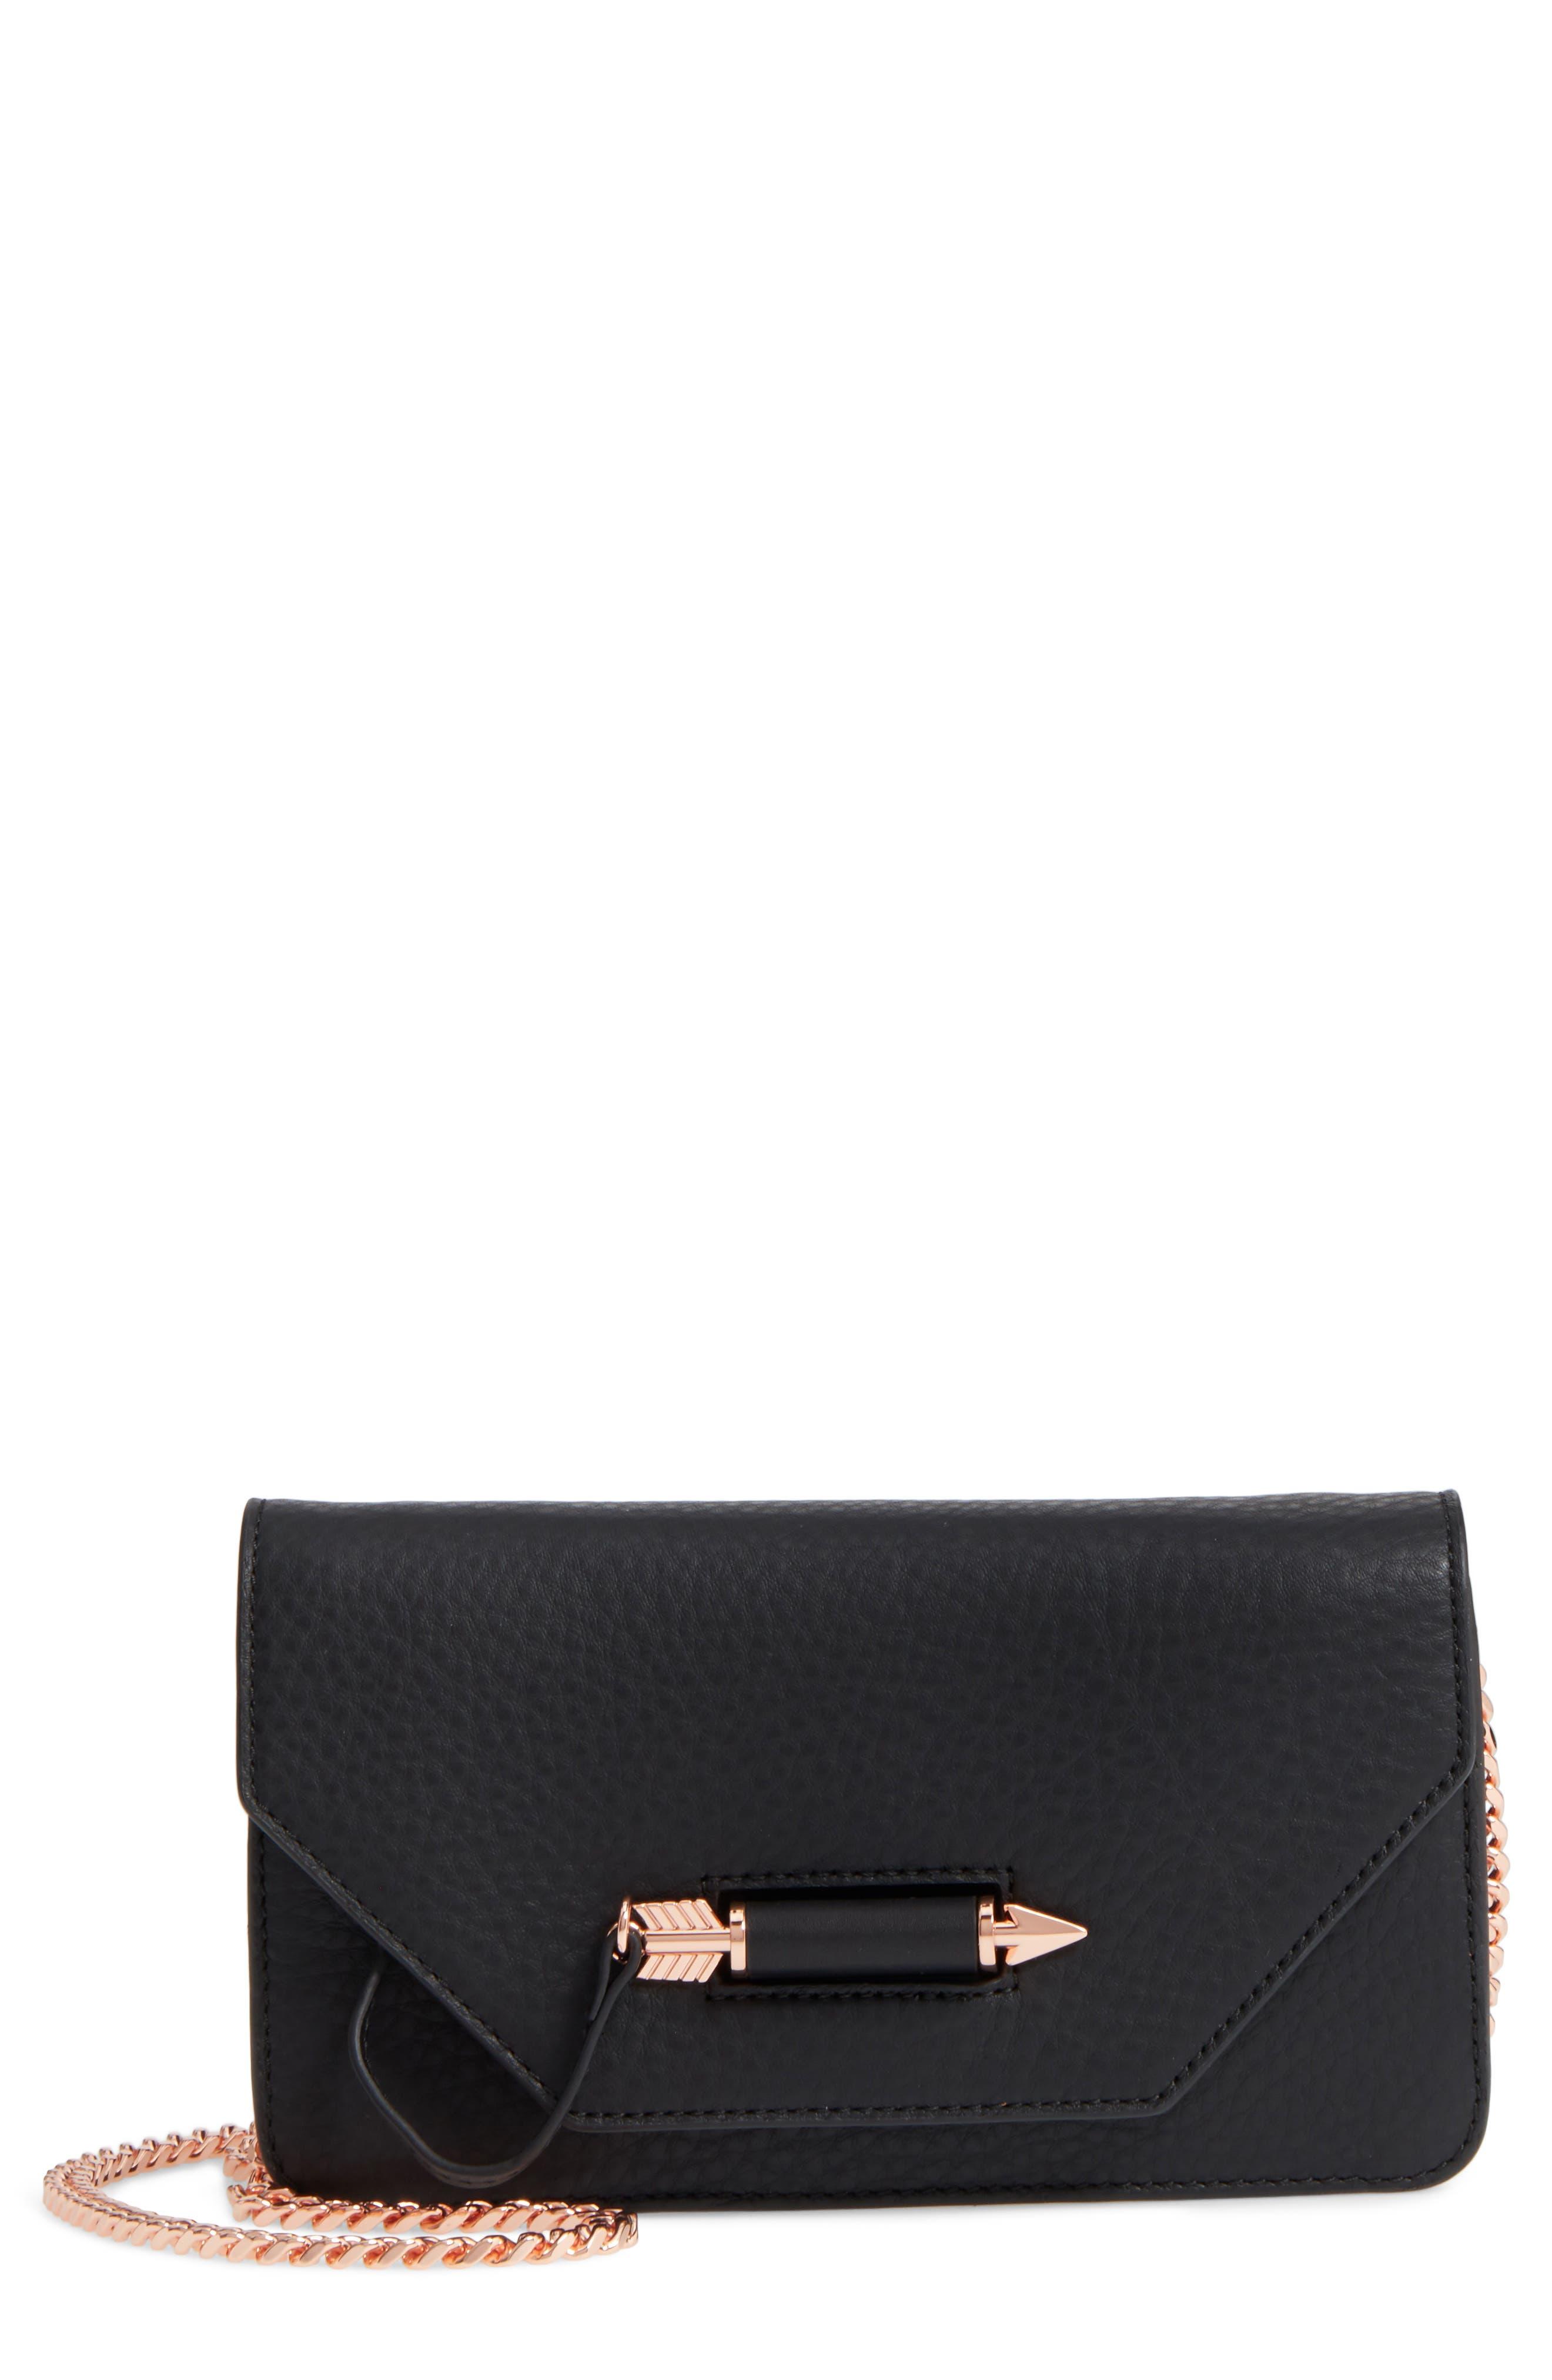 MACKAGE Mini Zoey Leather Crossbody Bag